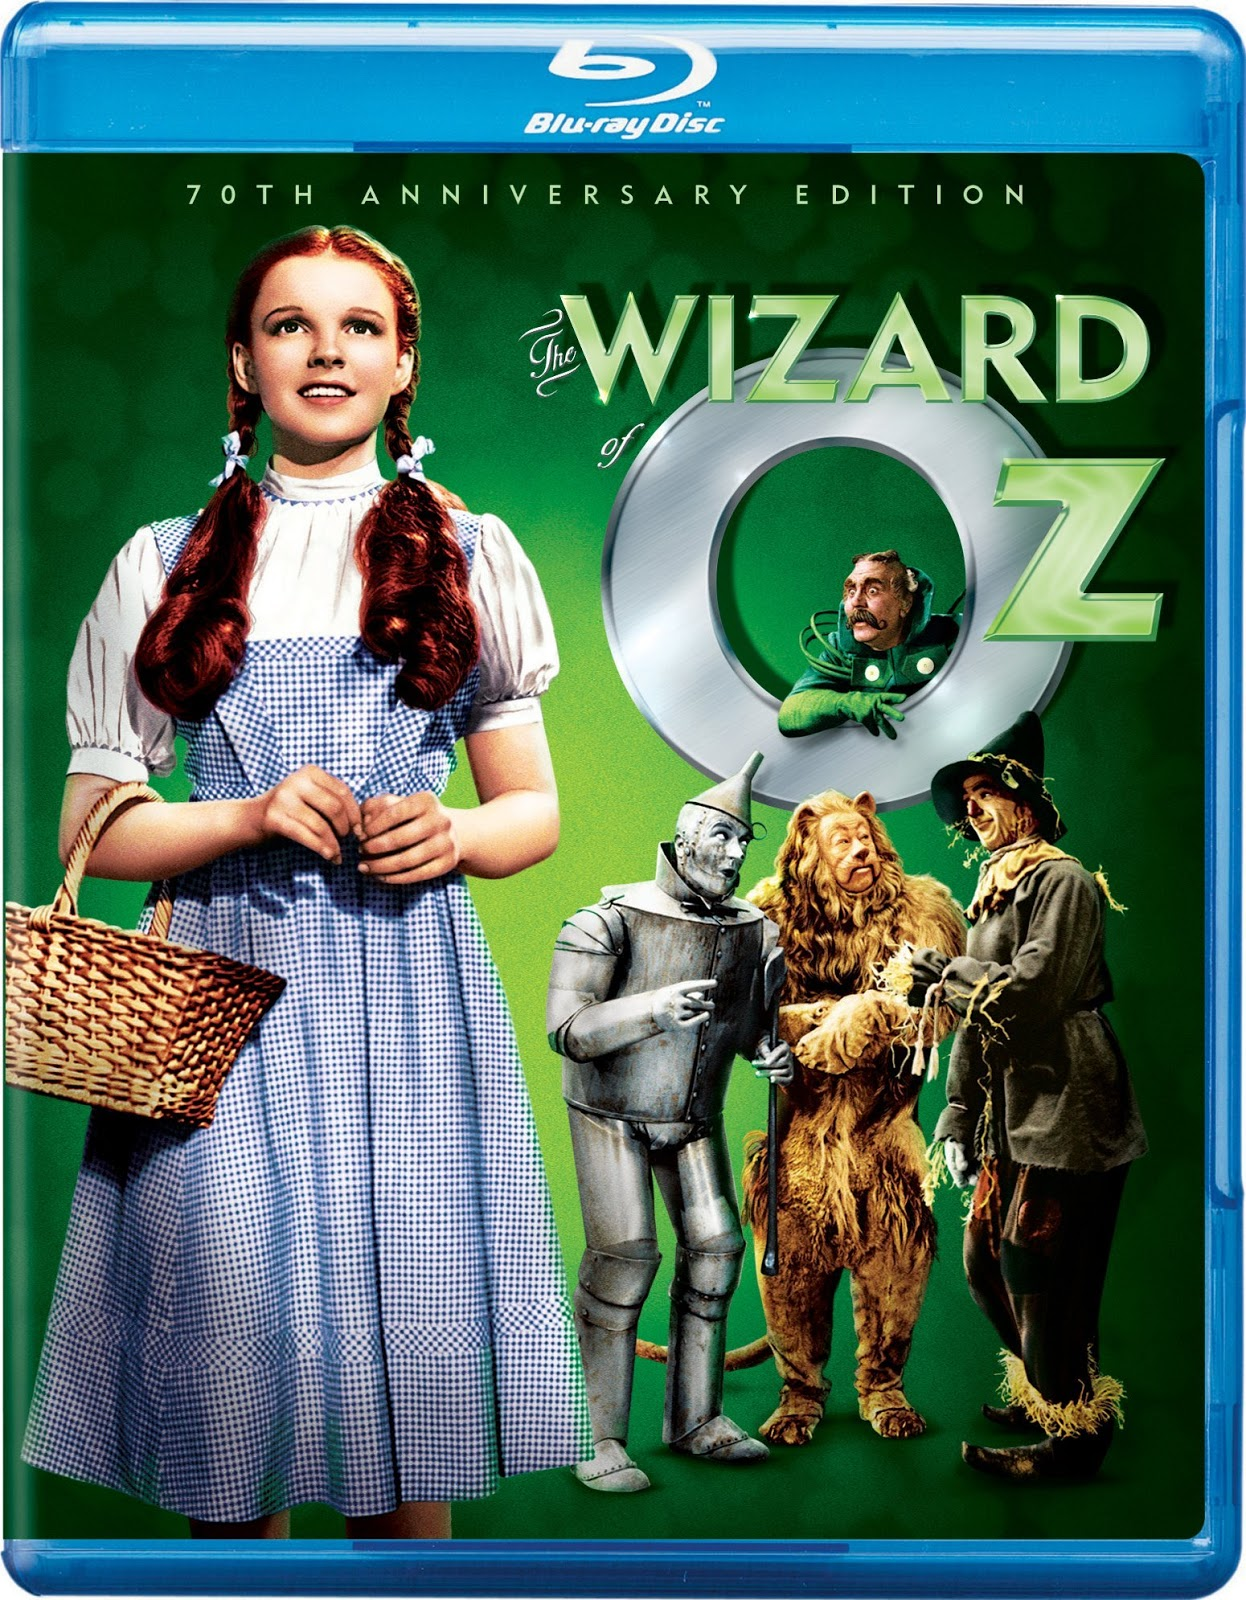 The Wizard of Oz (1939) ταινιες online seires xrysoi greek subs